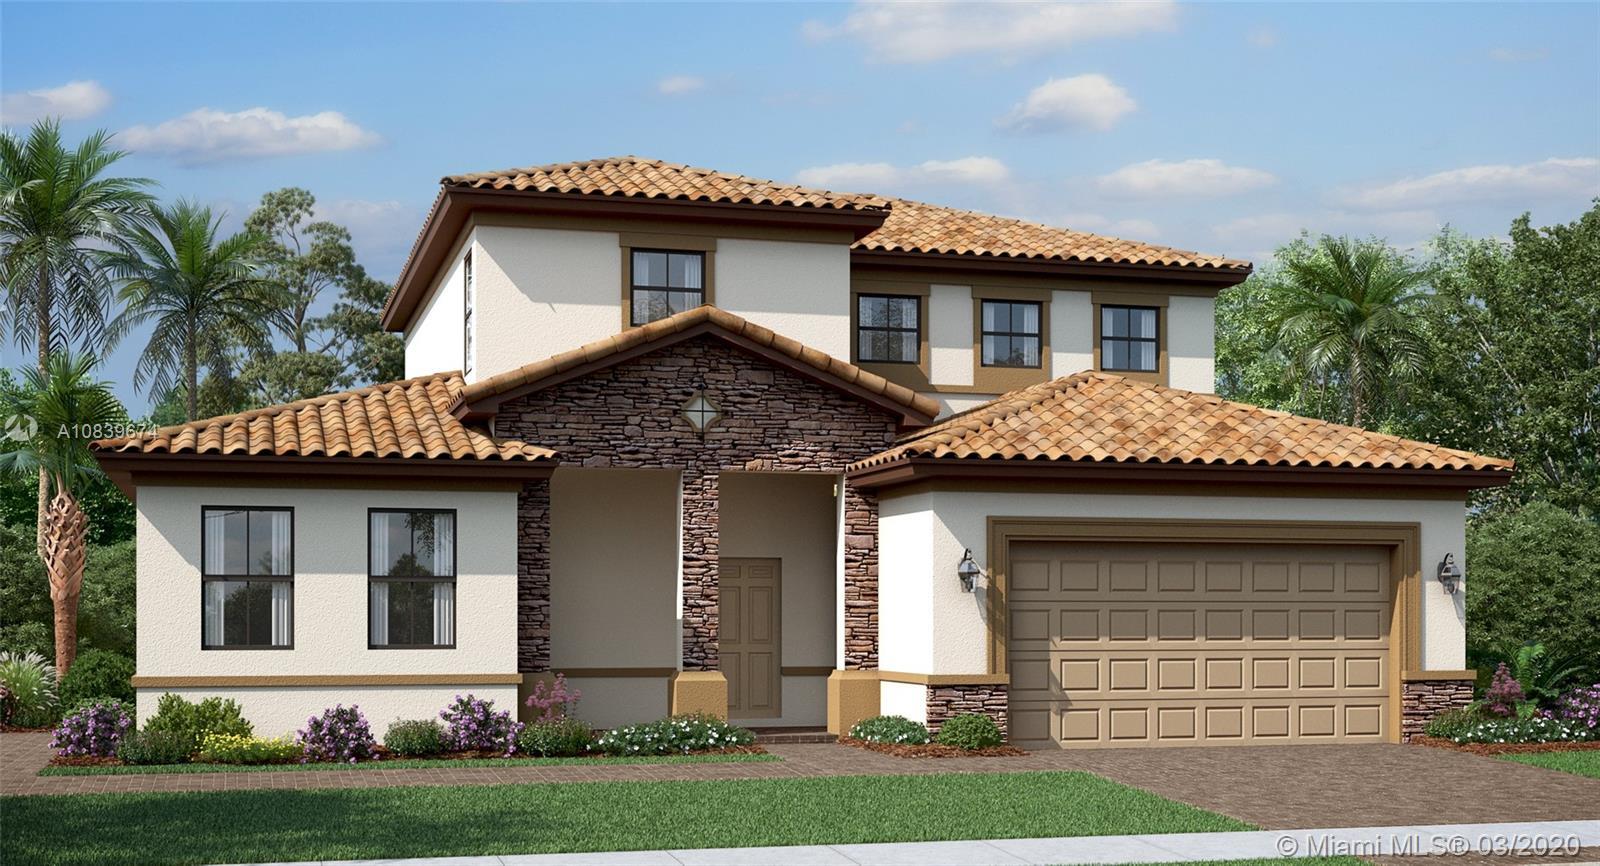 2606 SE 3 ST, Homestead, Florida 33033, 4 Bedrooms Bedrooms, ,4 BathroomsBathrooms,Residential,For Sale,2606 SE 3 ST,A10839674